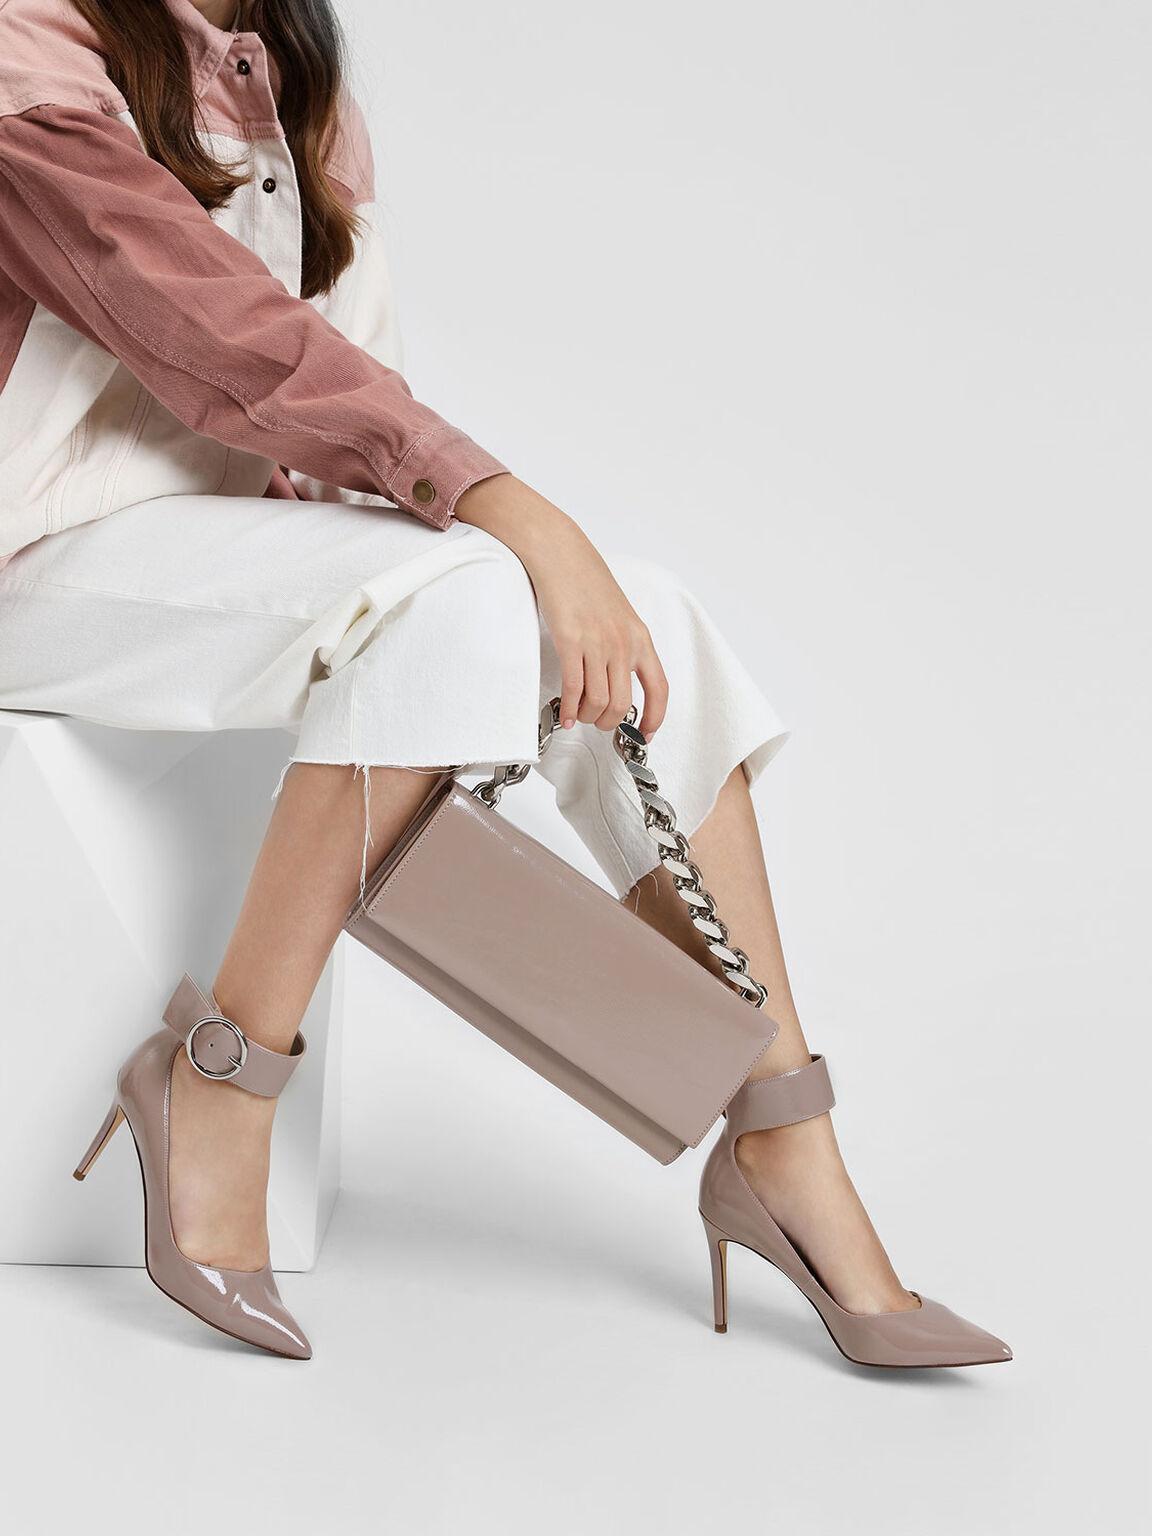 寬版踝帶高跟鞋, 膚色, hi-res